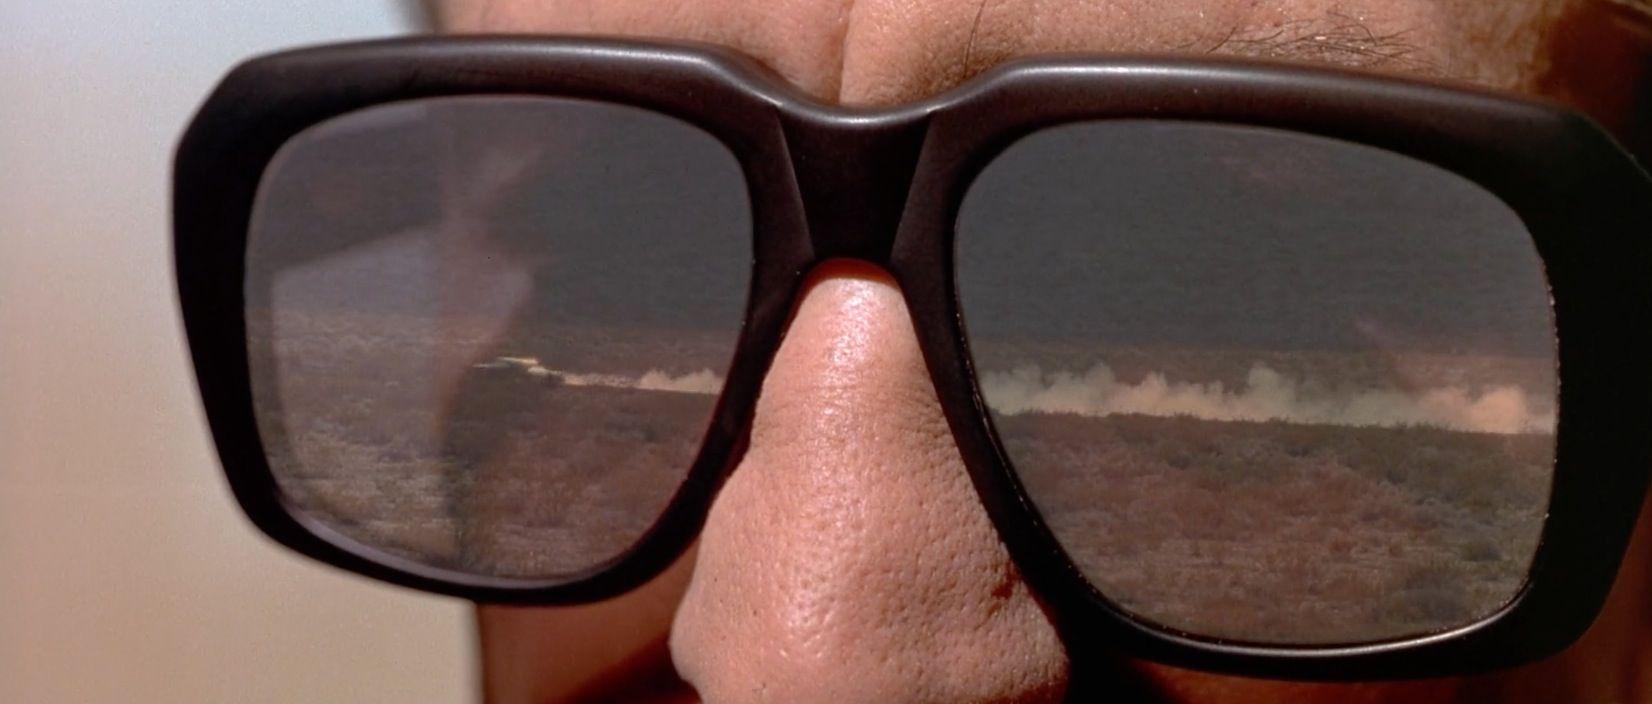 a897076d82 Ultra Goliath II vintage sunglasses worn by Robert De Niro in CASINO